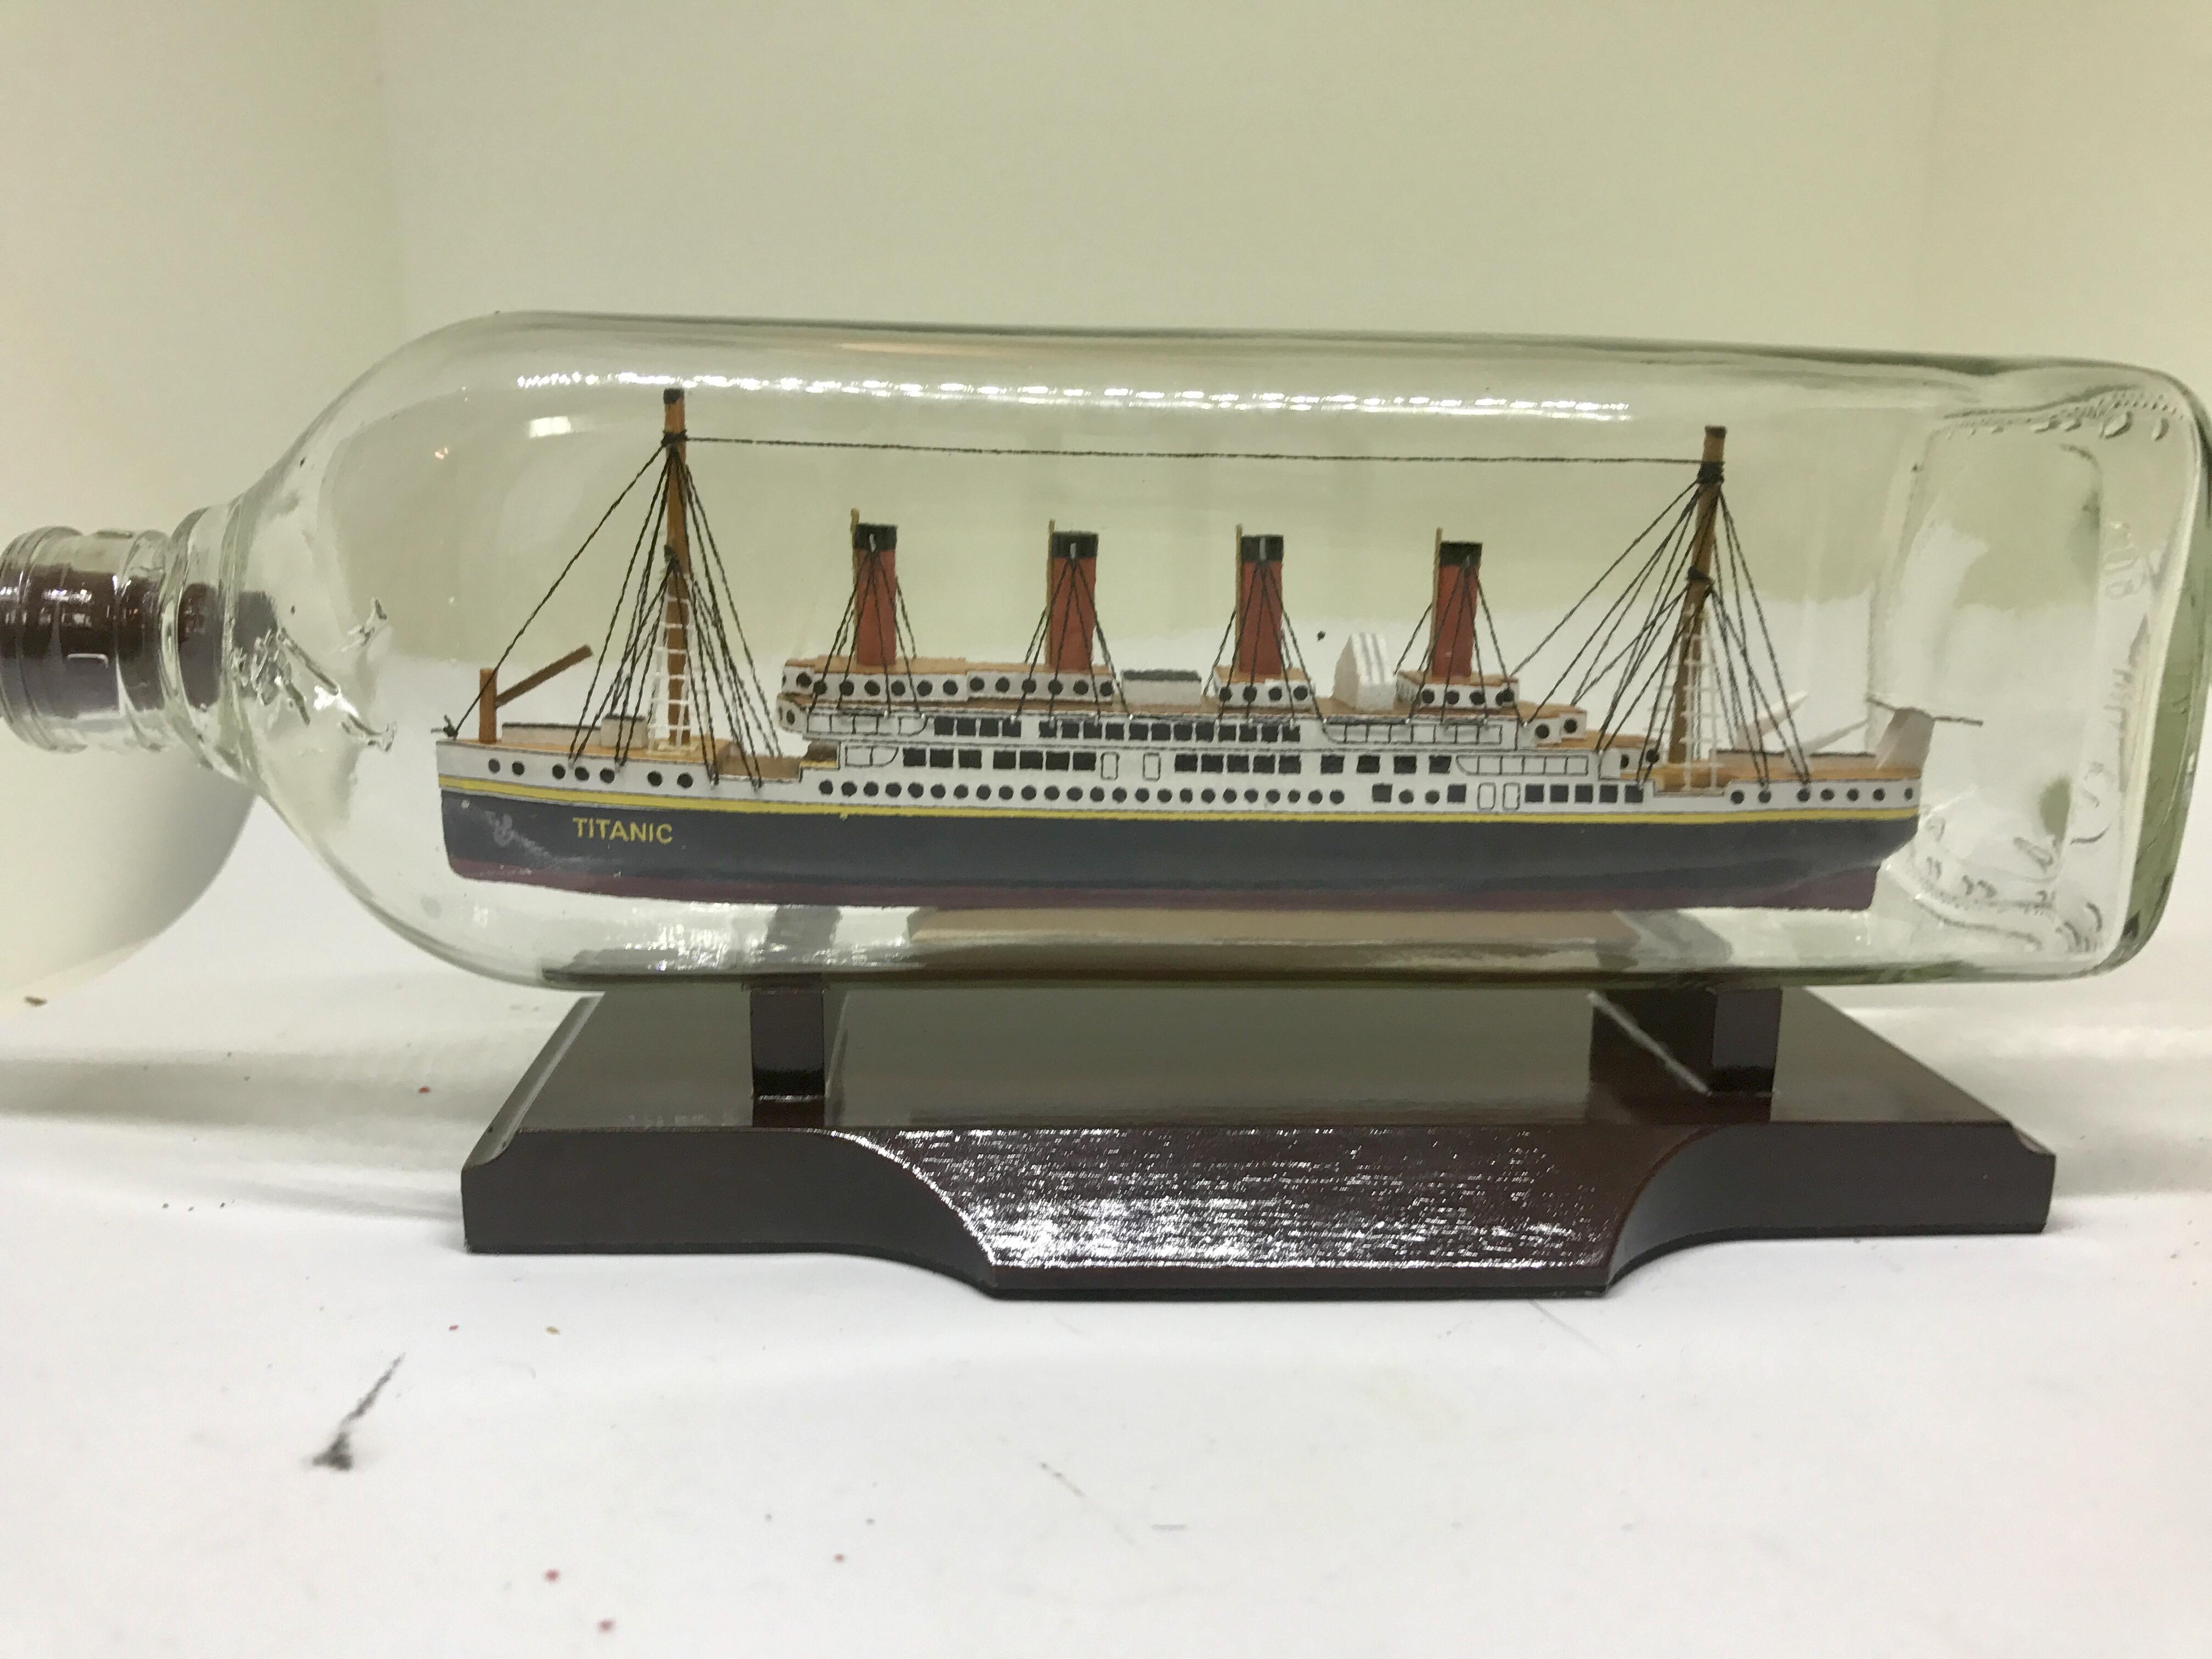 Titanic ship in a bottle